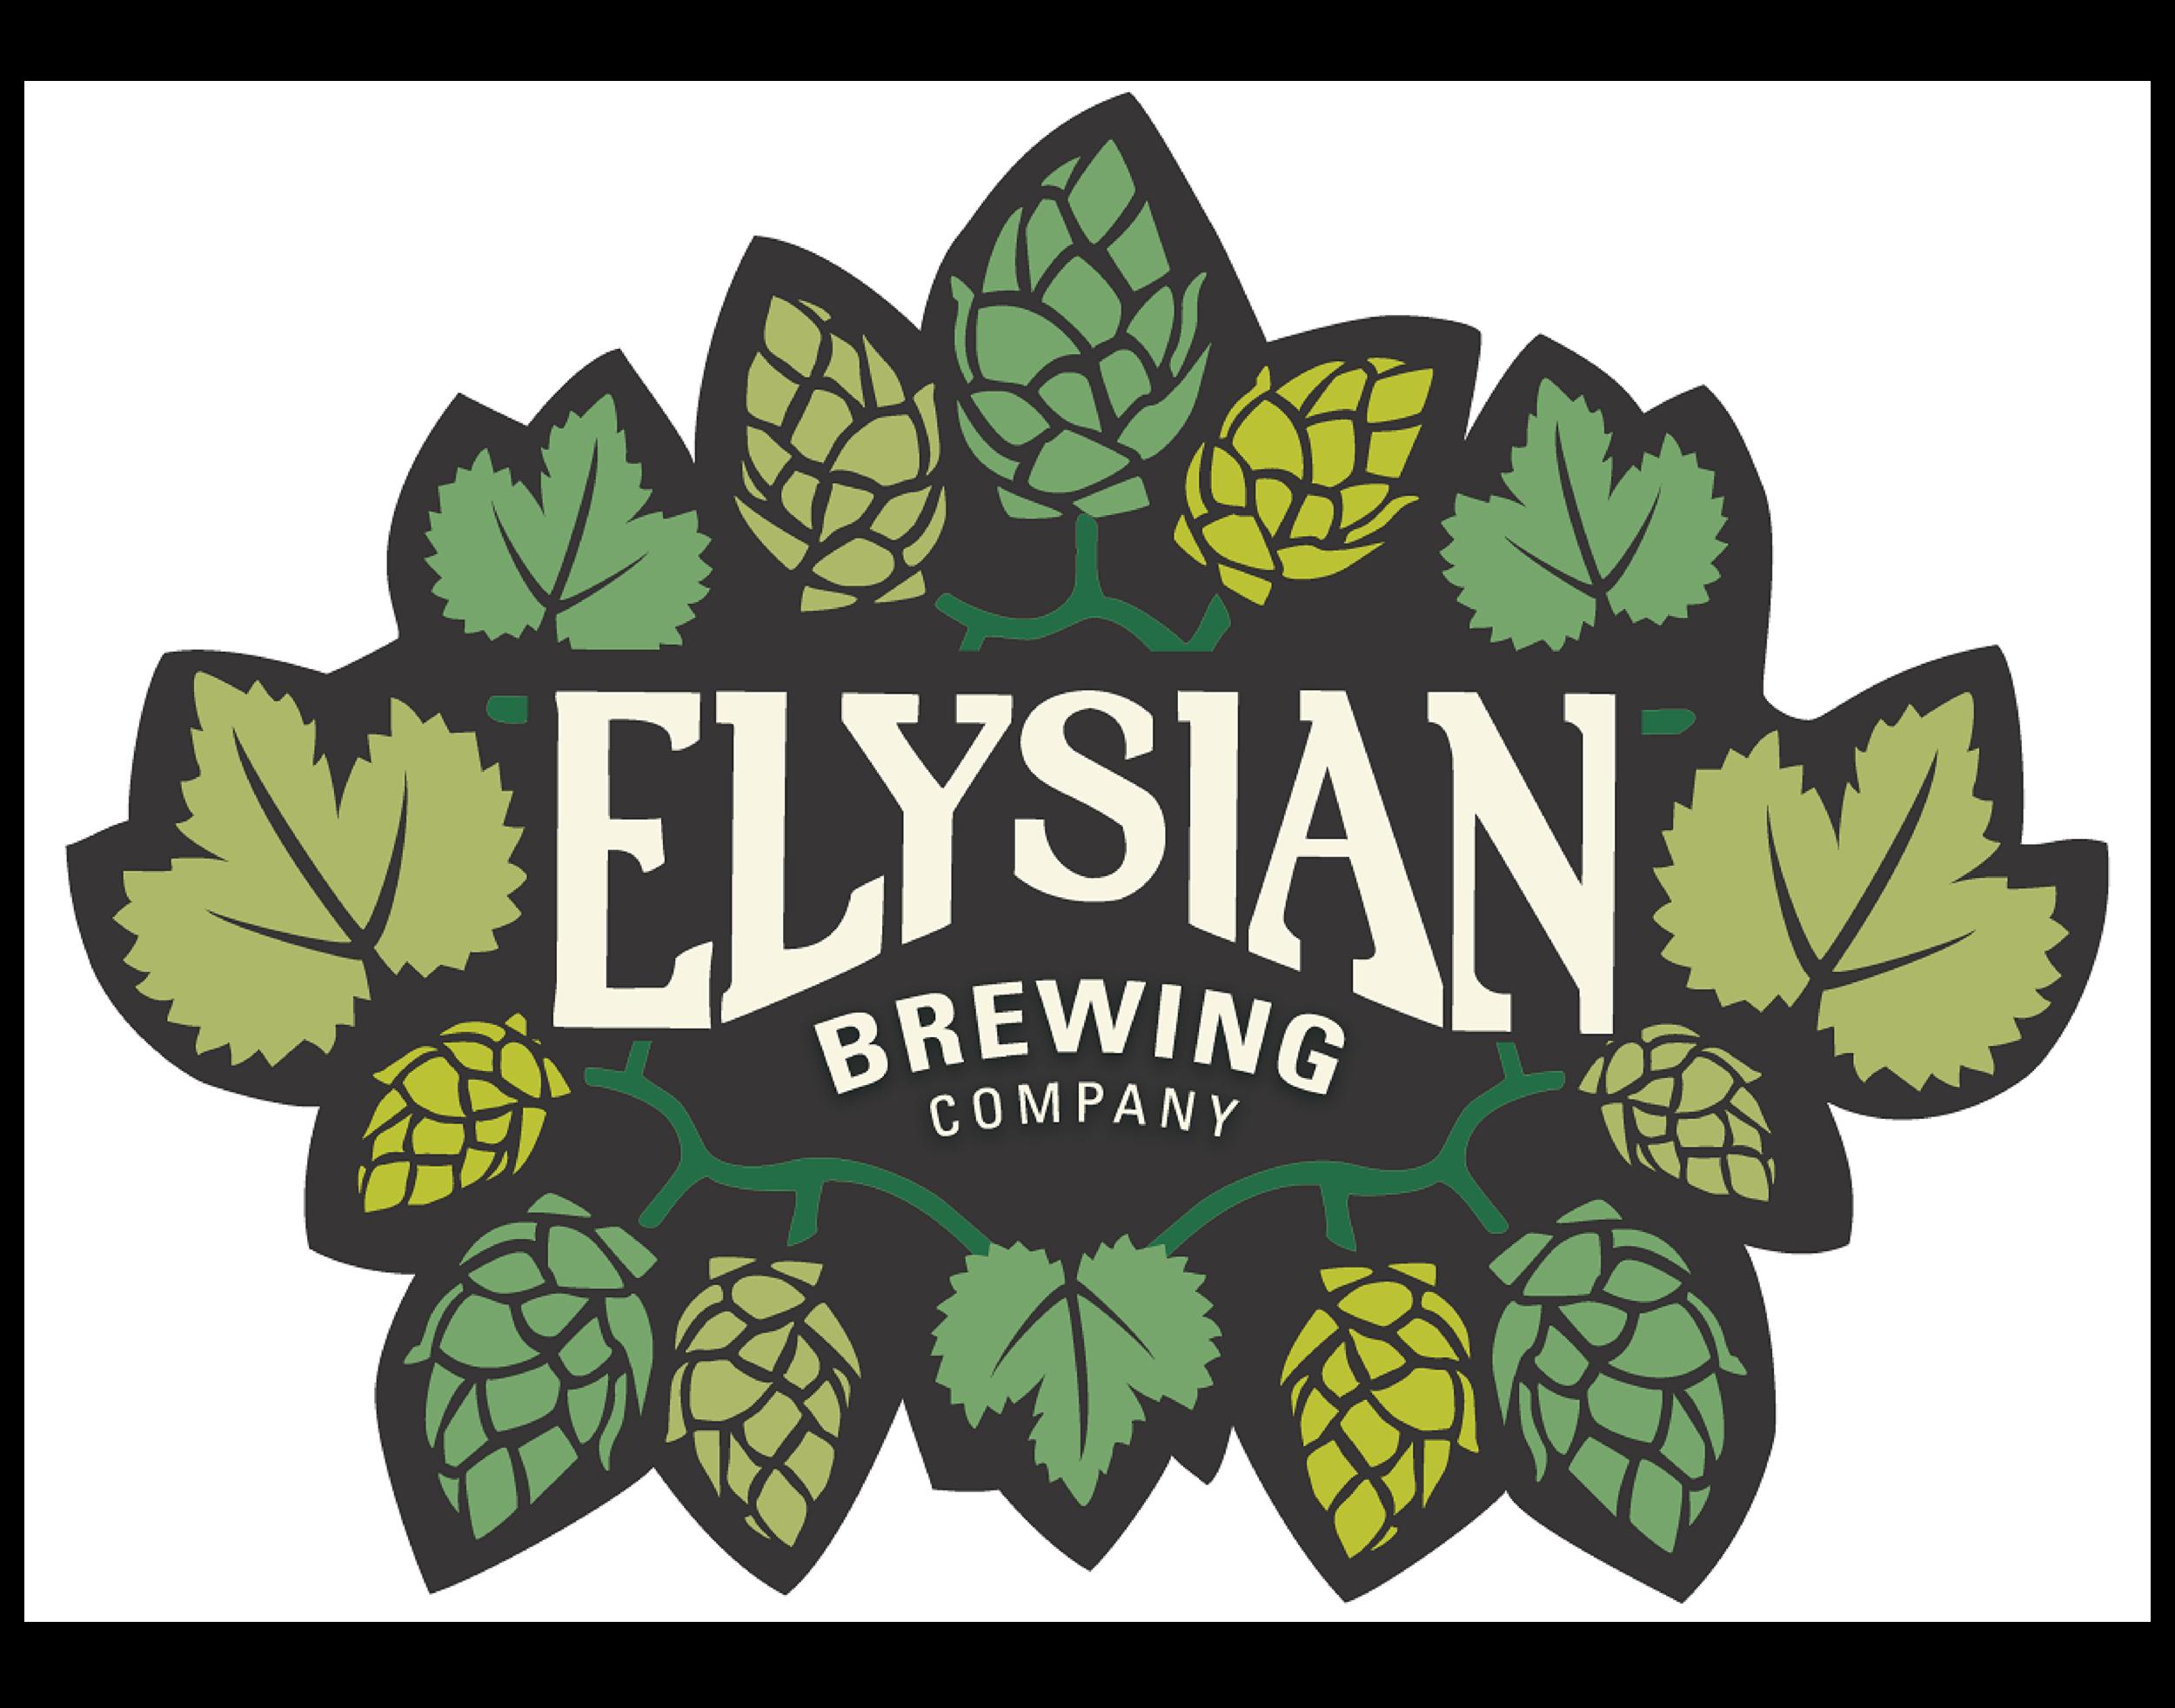 Elysian Brewing Company logo. Links to Elysian Brewing Company website.